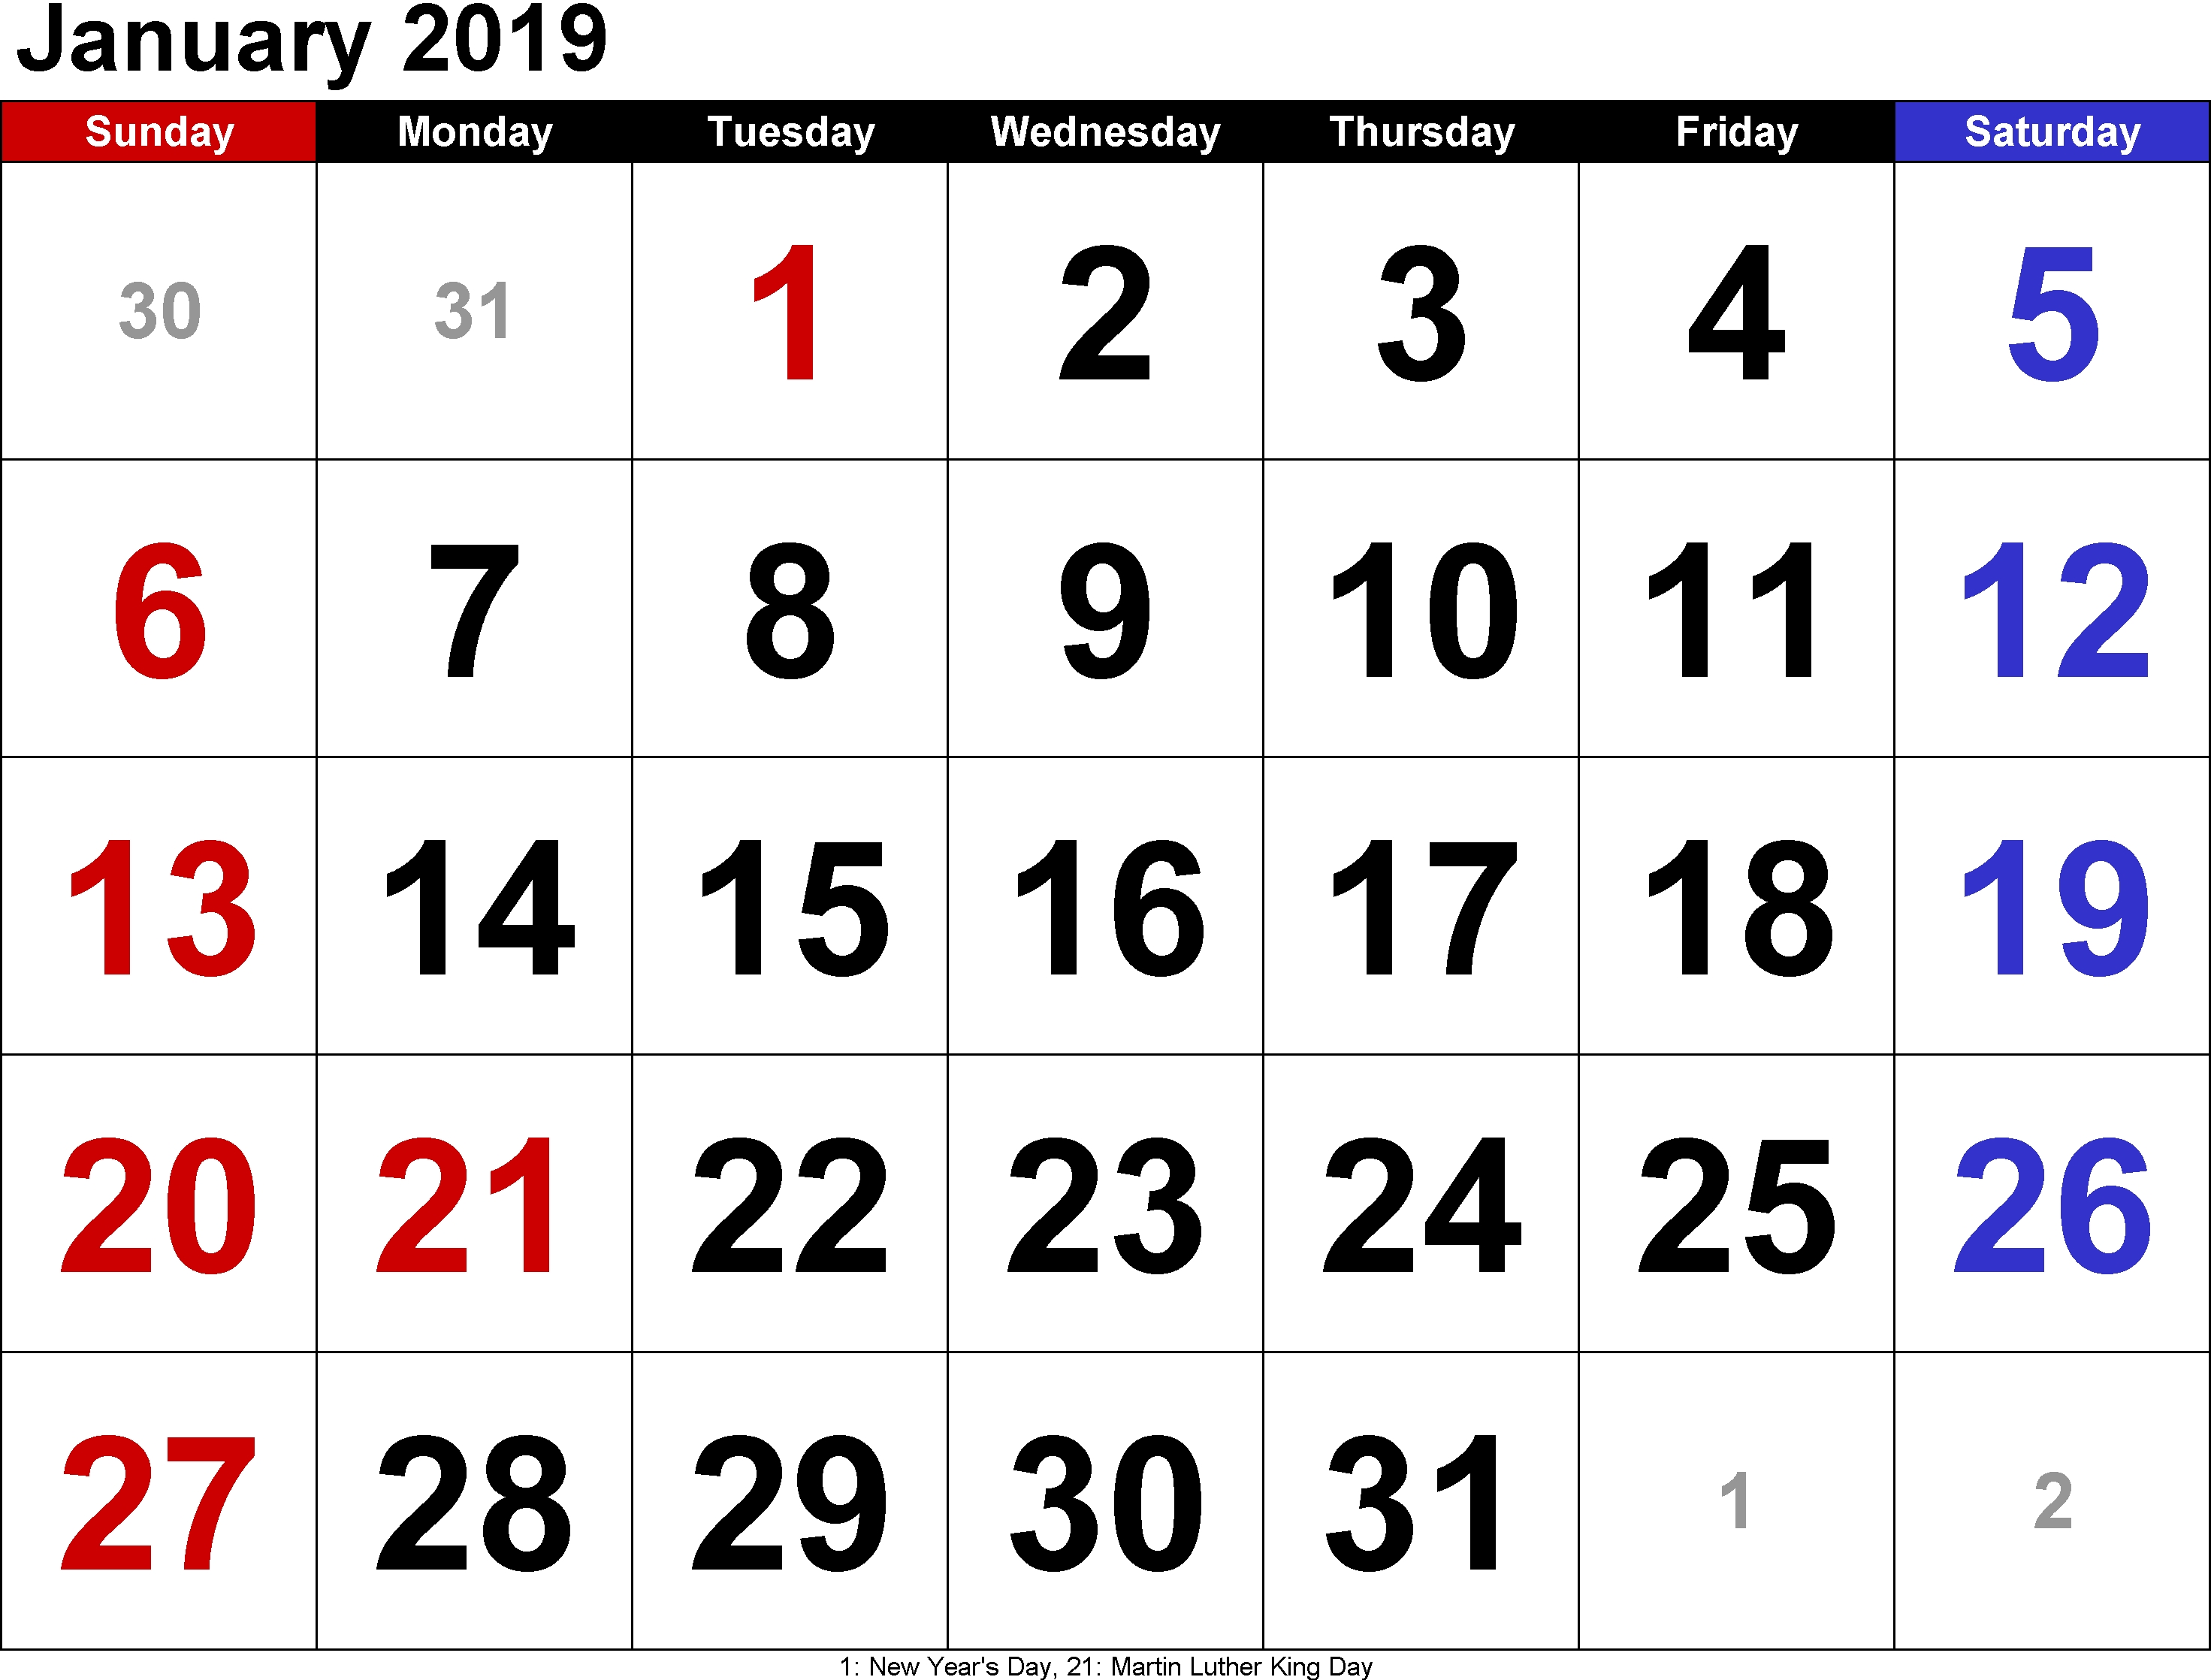 Free January Calendar 2019 | January 2019 Calendar | Pinterest July 9 2019 Calendar